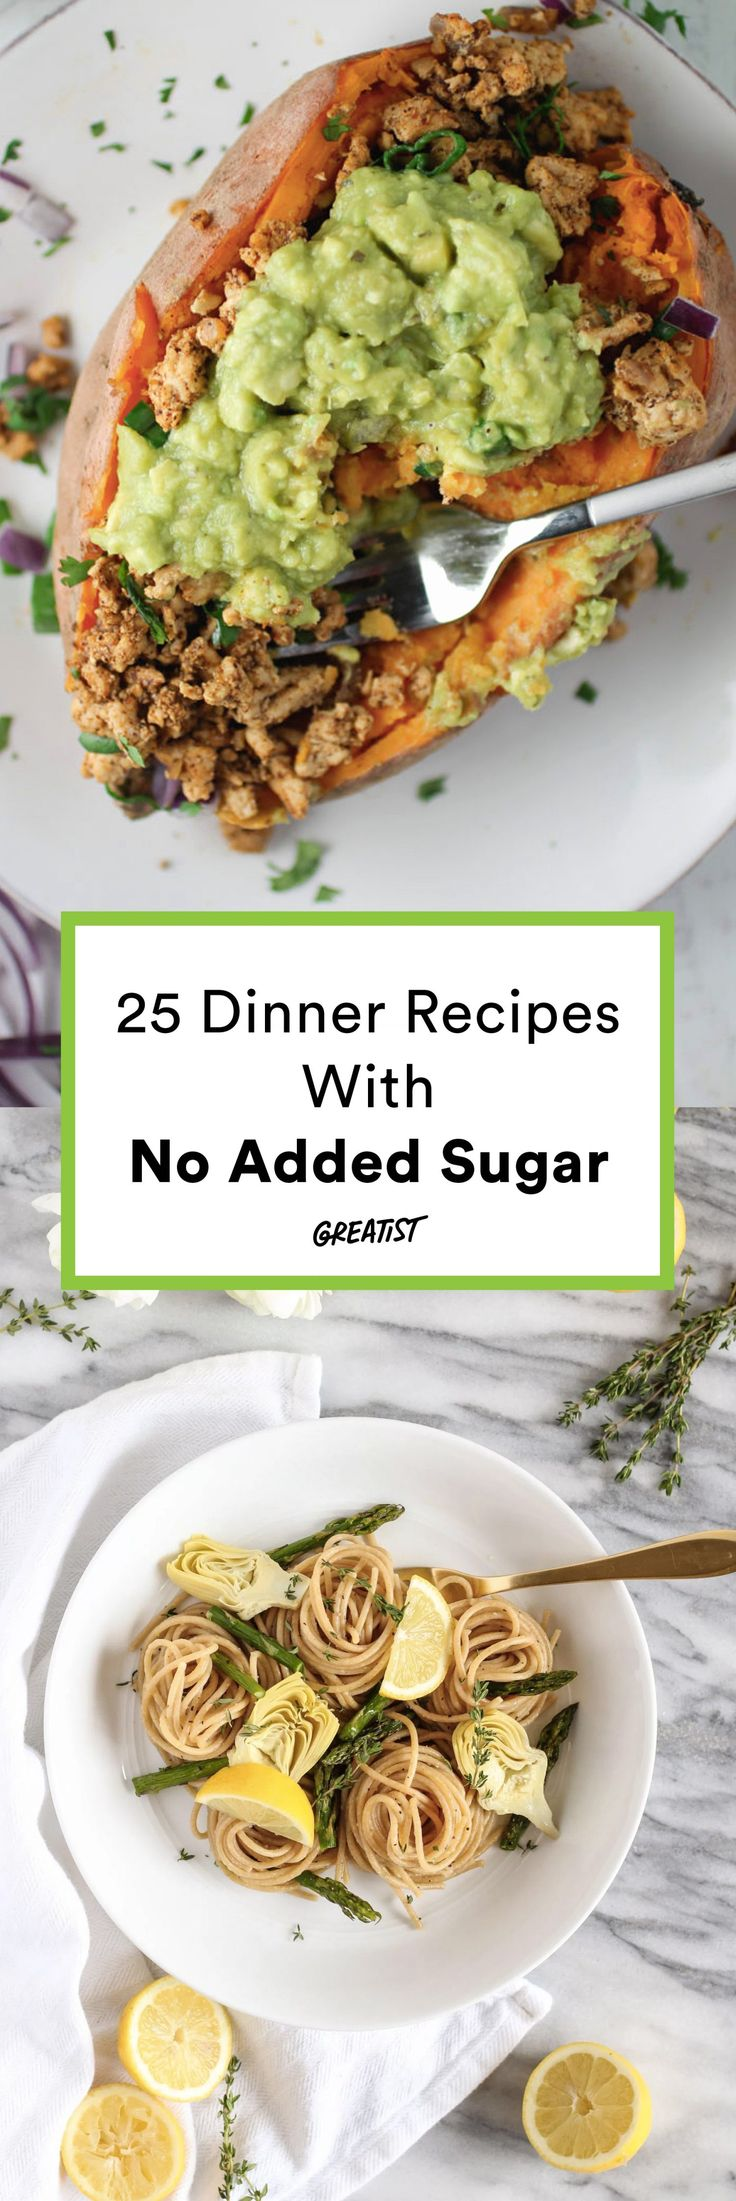 No ketchup, no honey, no nothin'. #greatist https://greatist.com/eat/sugar-free-dinner-recipes